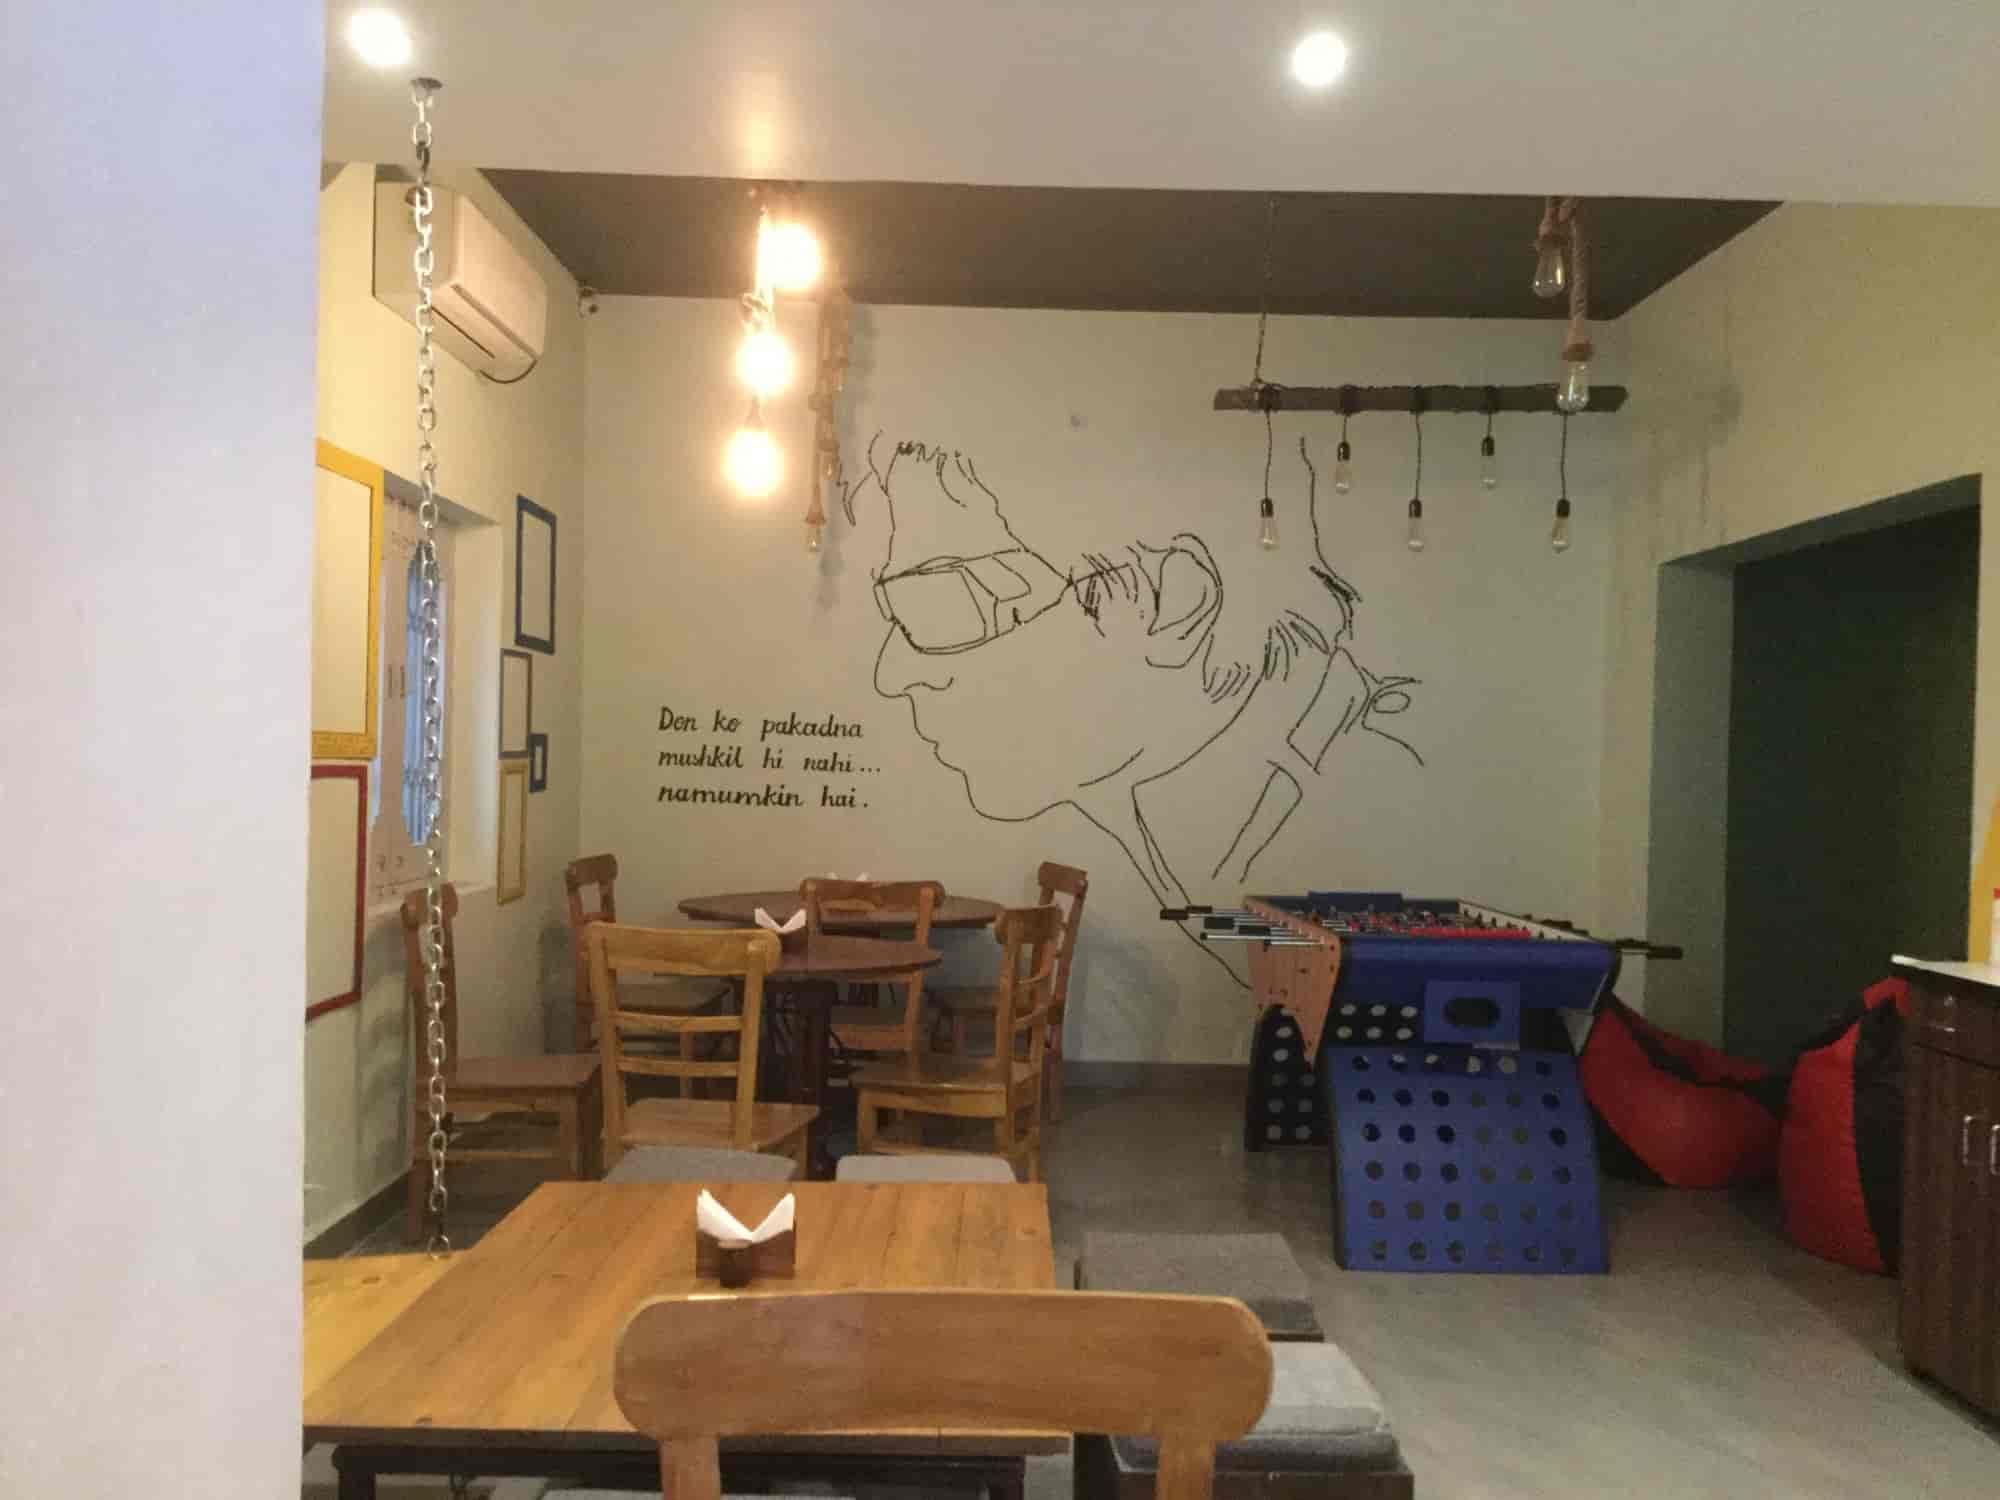 Popular Red Carpet Cafe Photos, Gomti Nagar, Lucknow- Pictures & Images  LS18